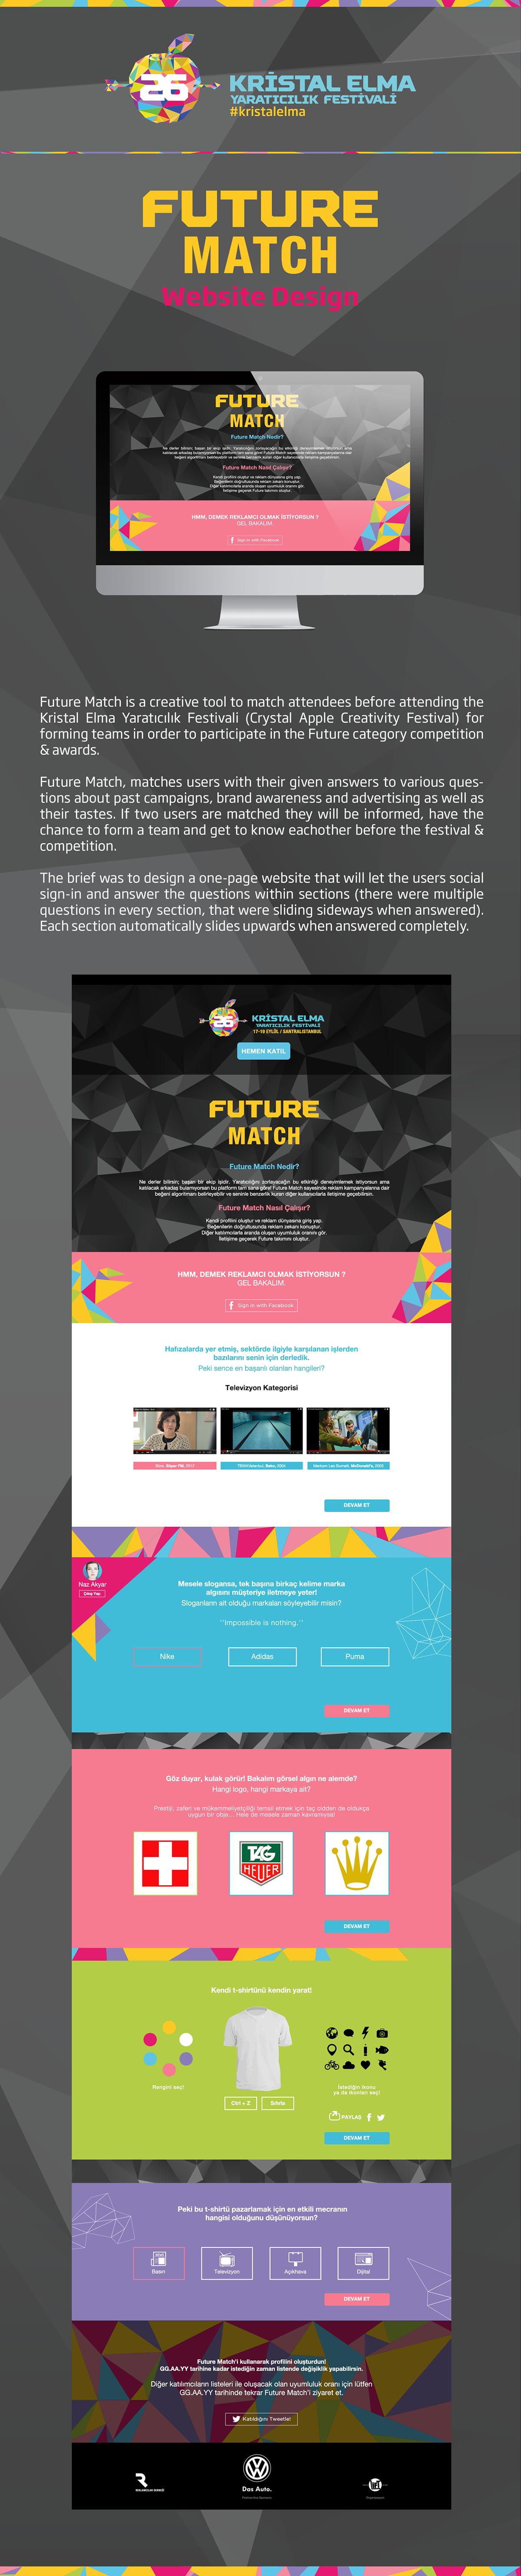 kristal elma festival website Competition advertising festival